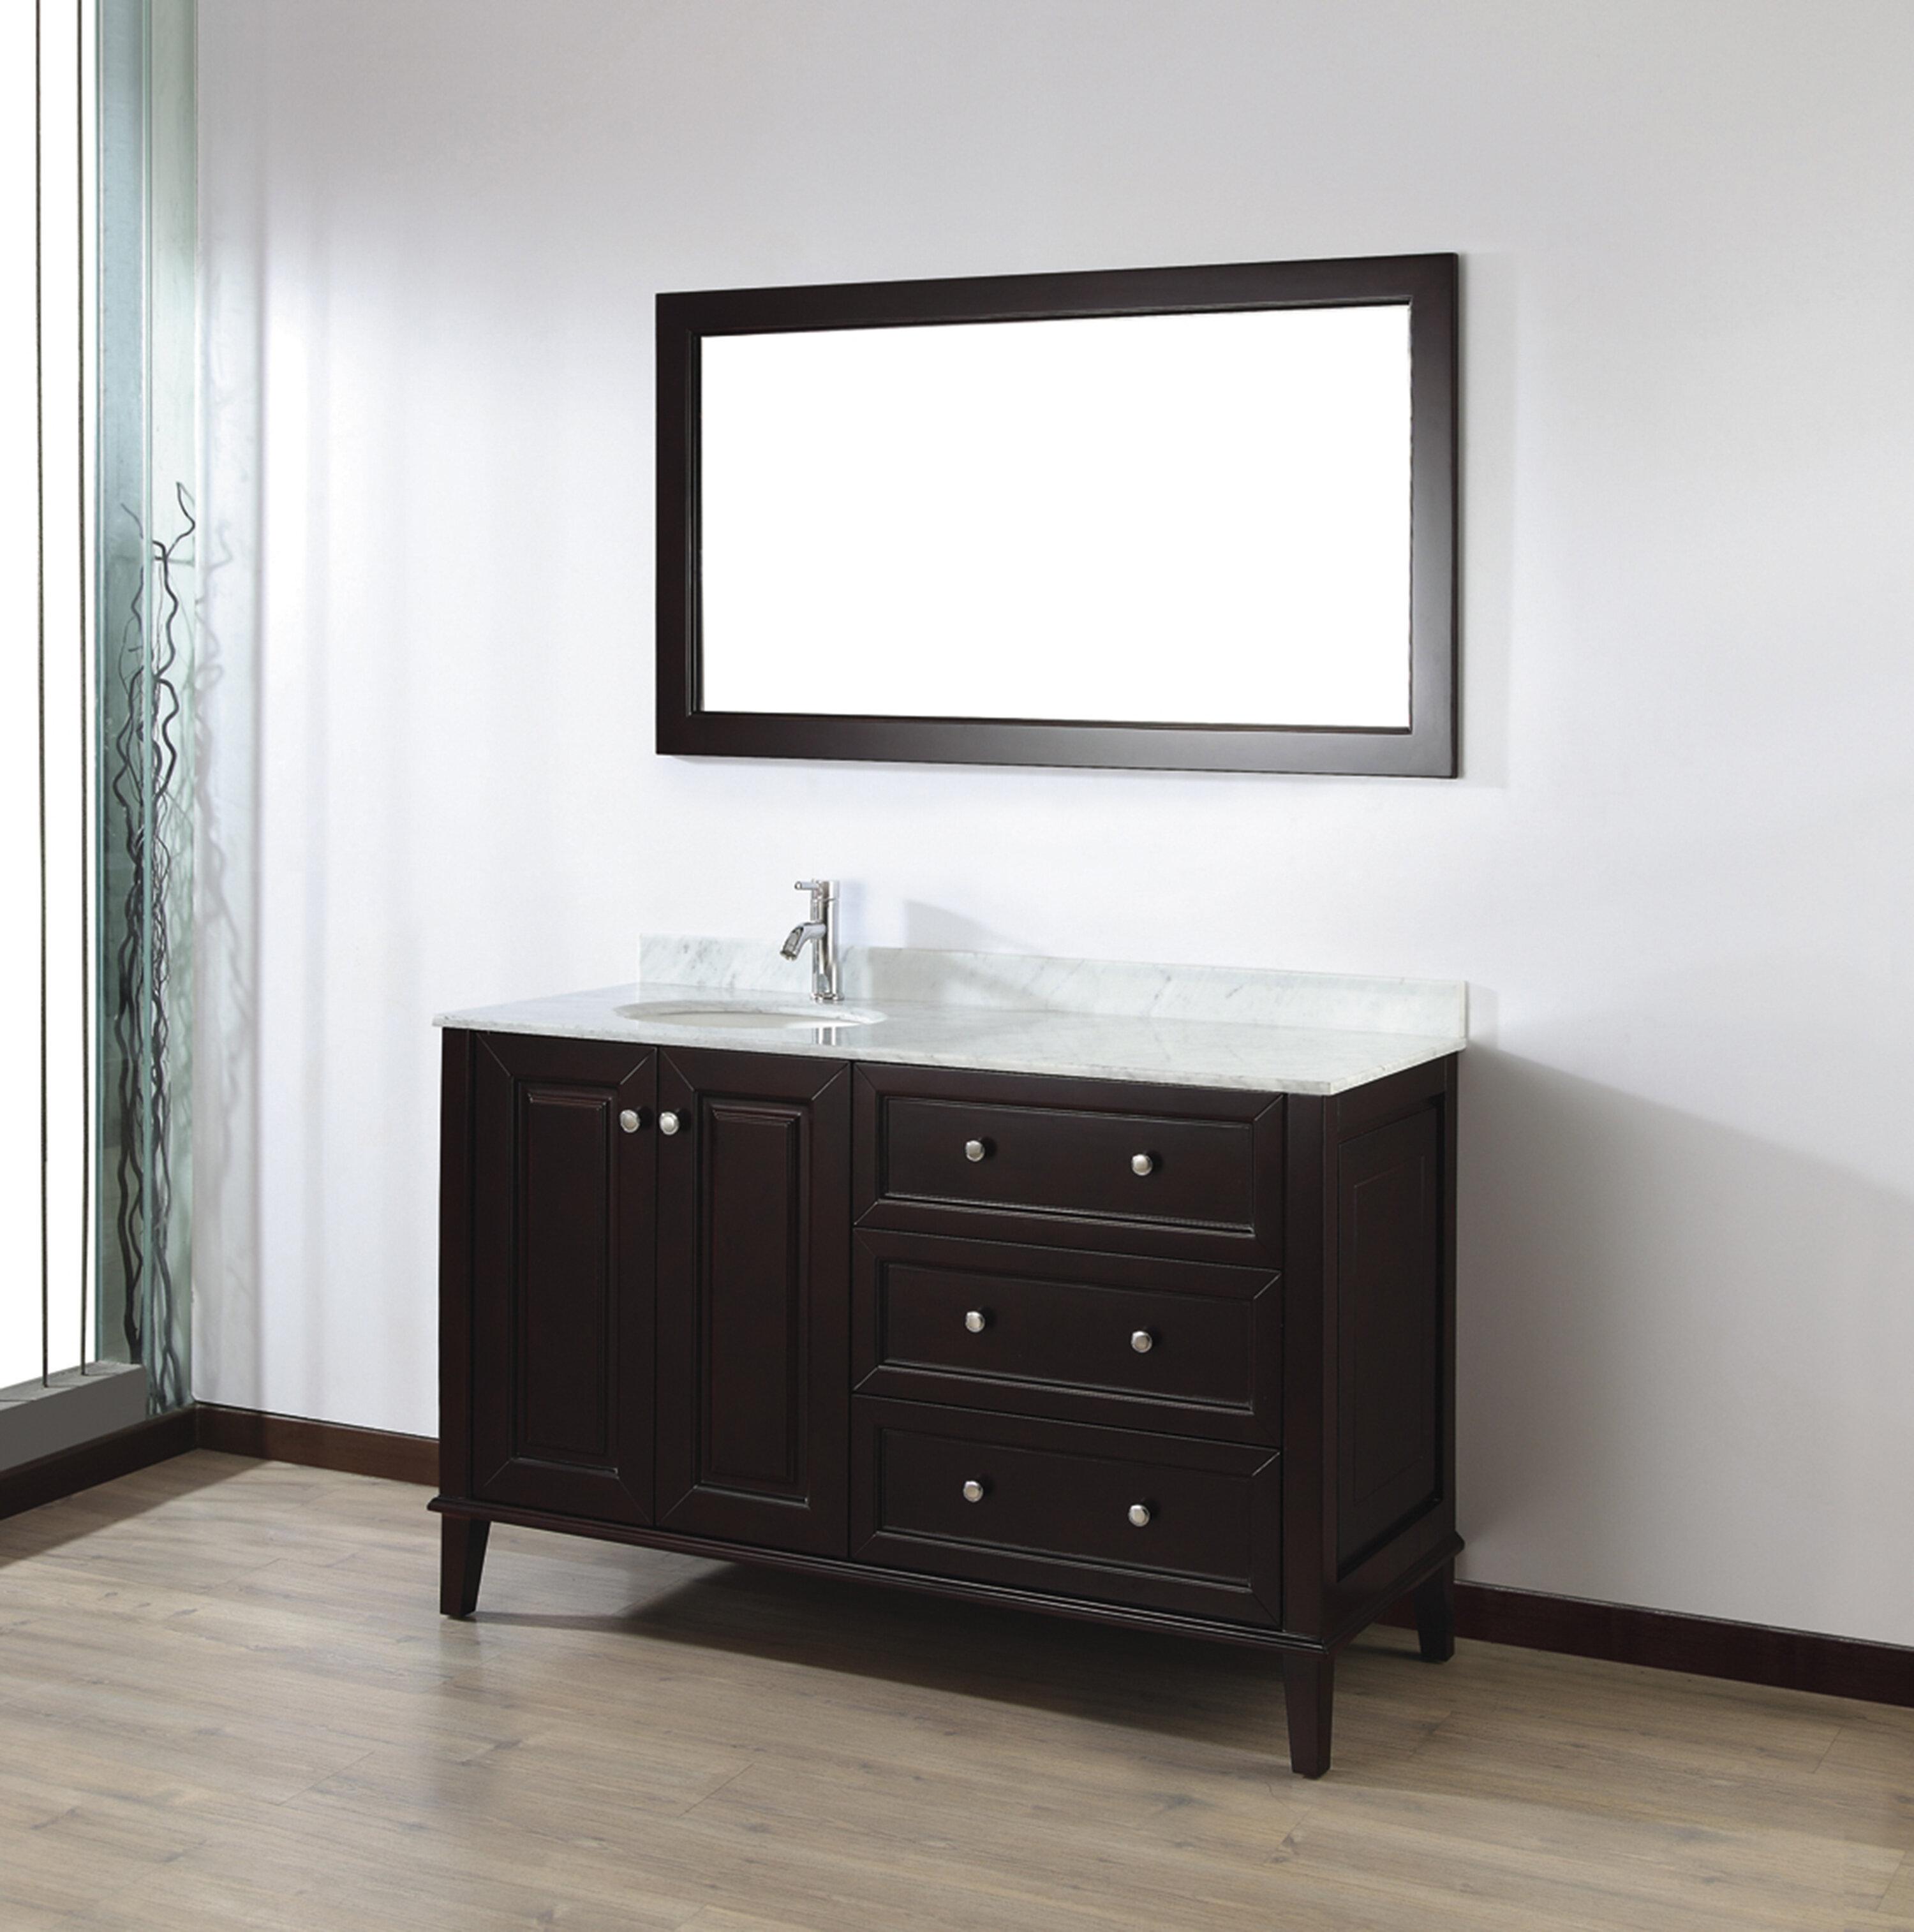 Bauhaus Bath Milly 55 Single Bathroom Vanity Set With Mirror Reviews Wayfair